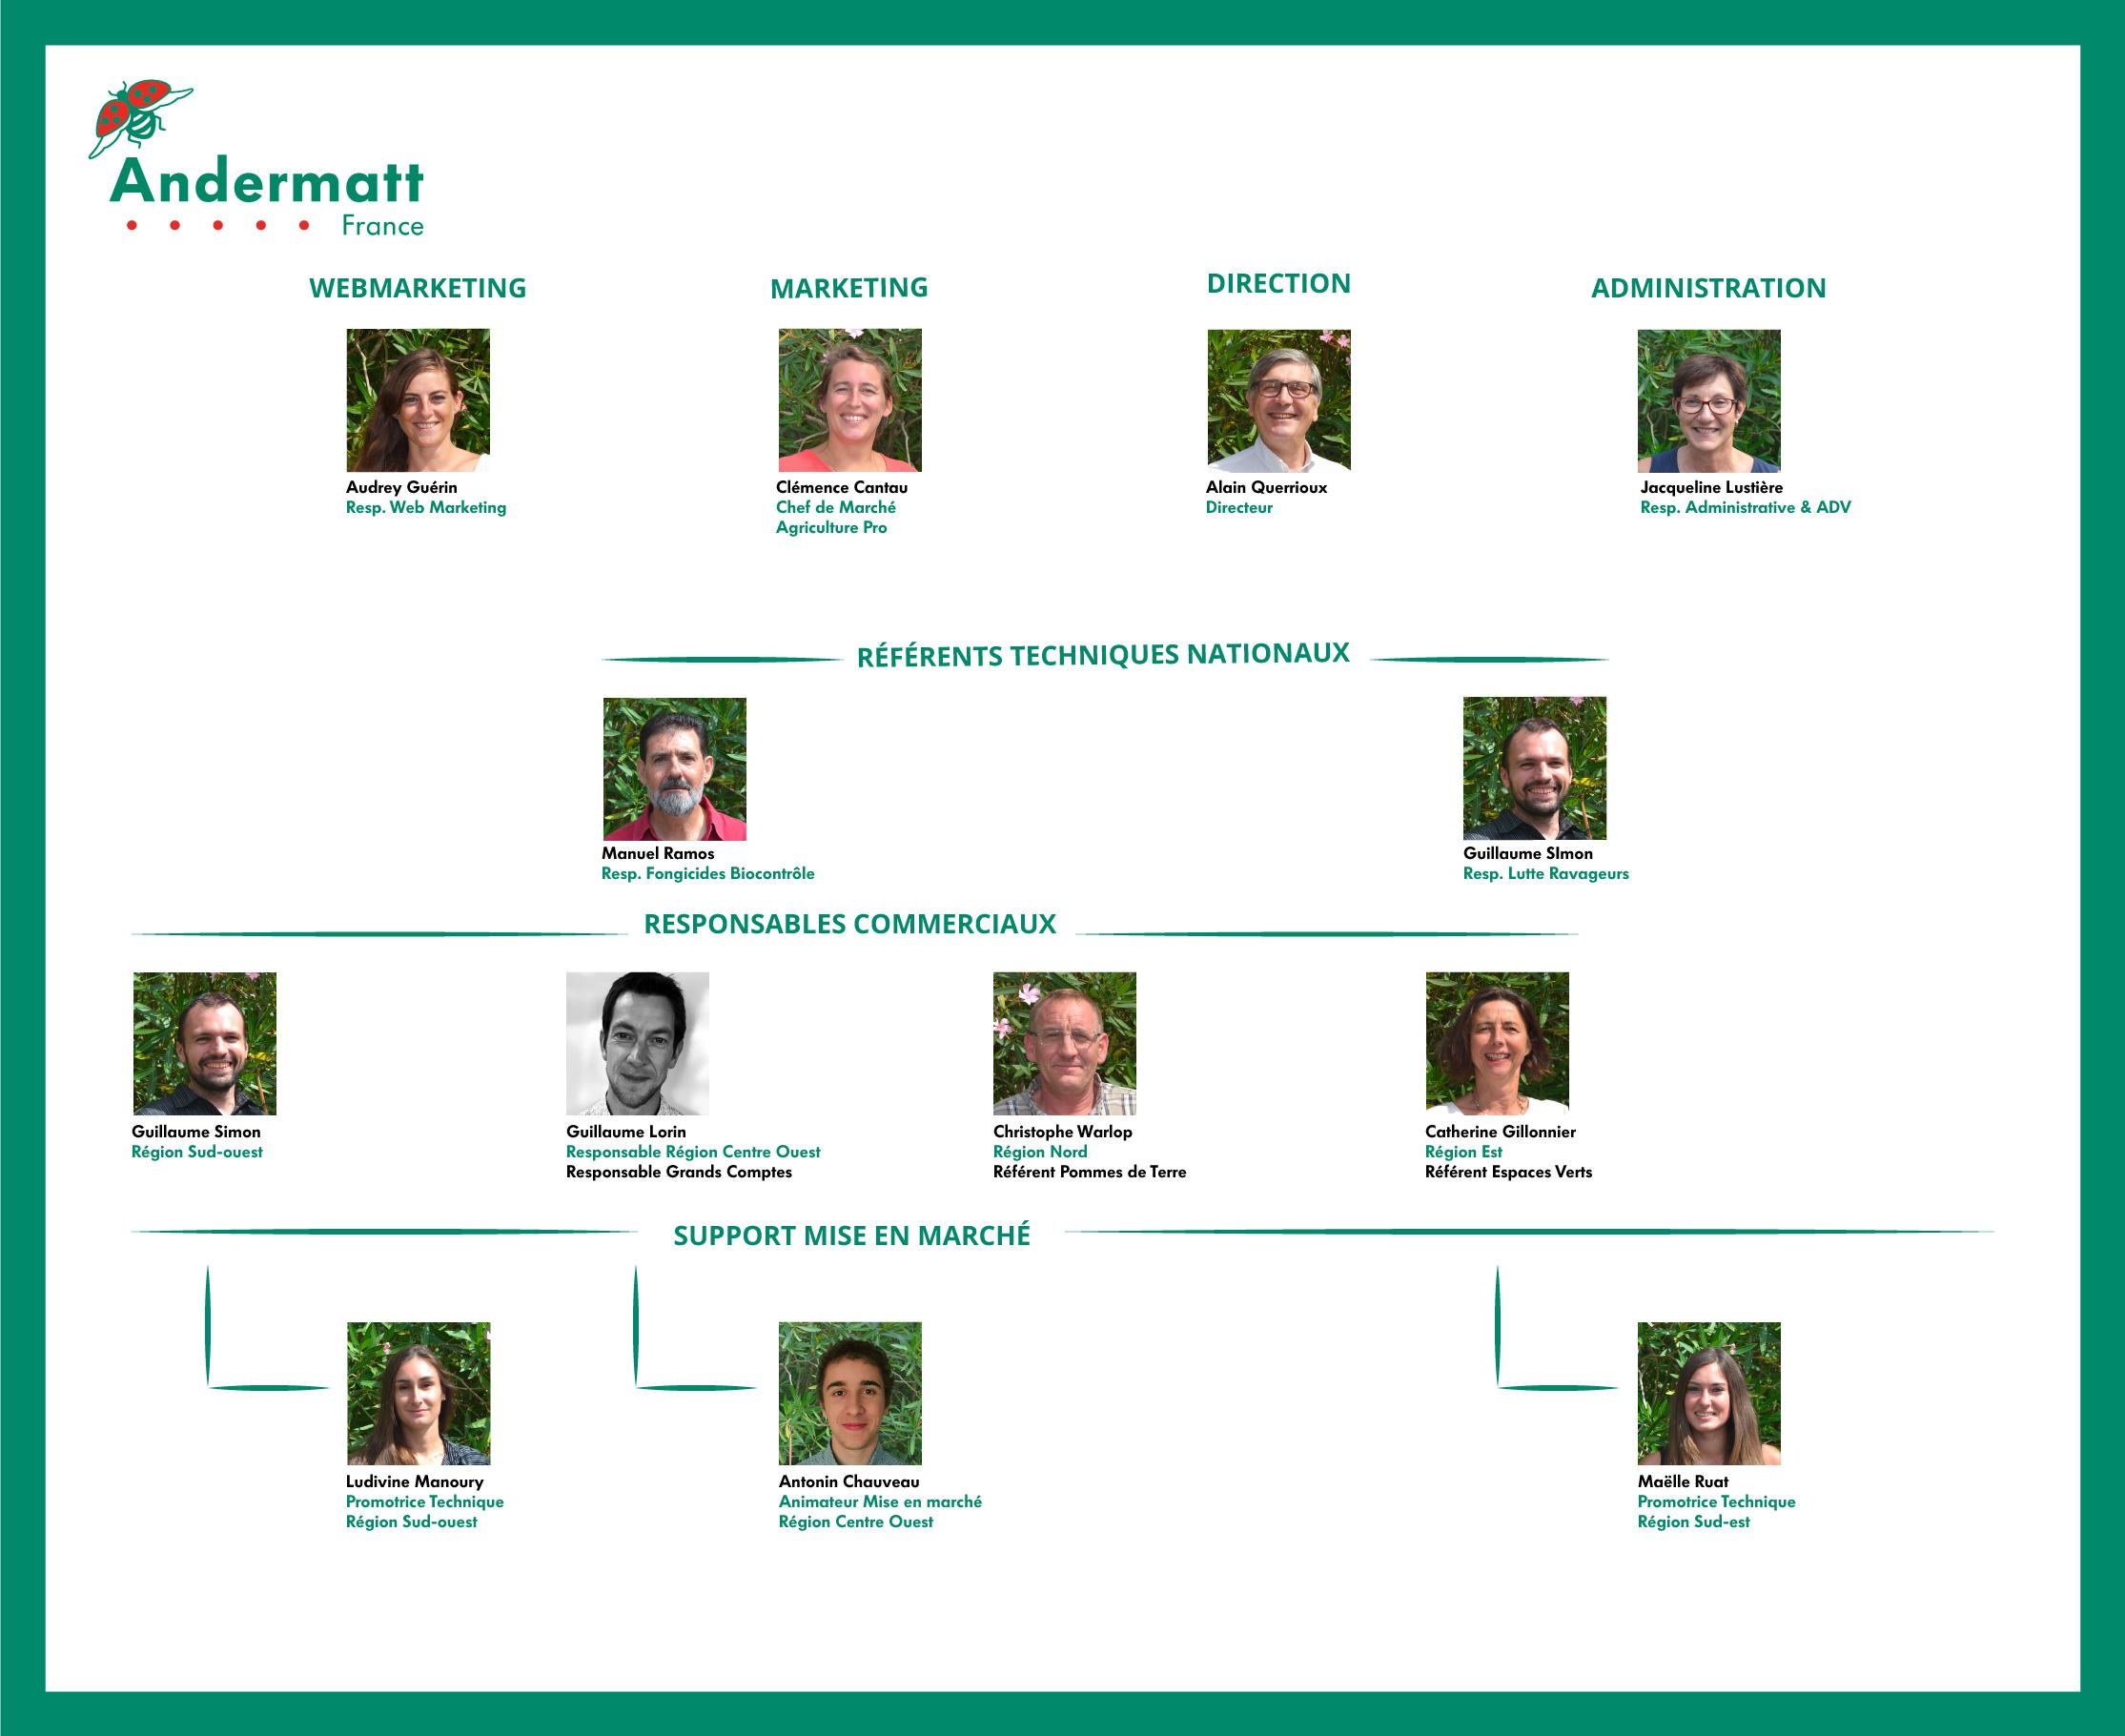 L'équipe Andermatt France